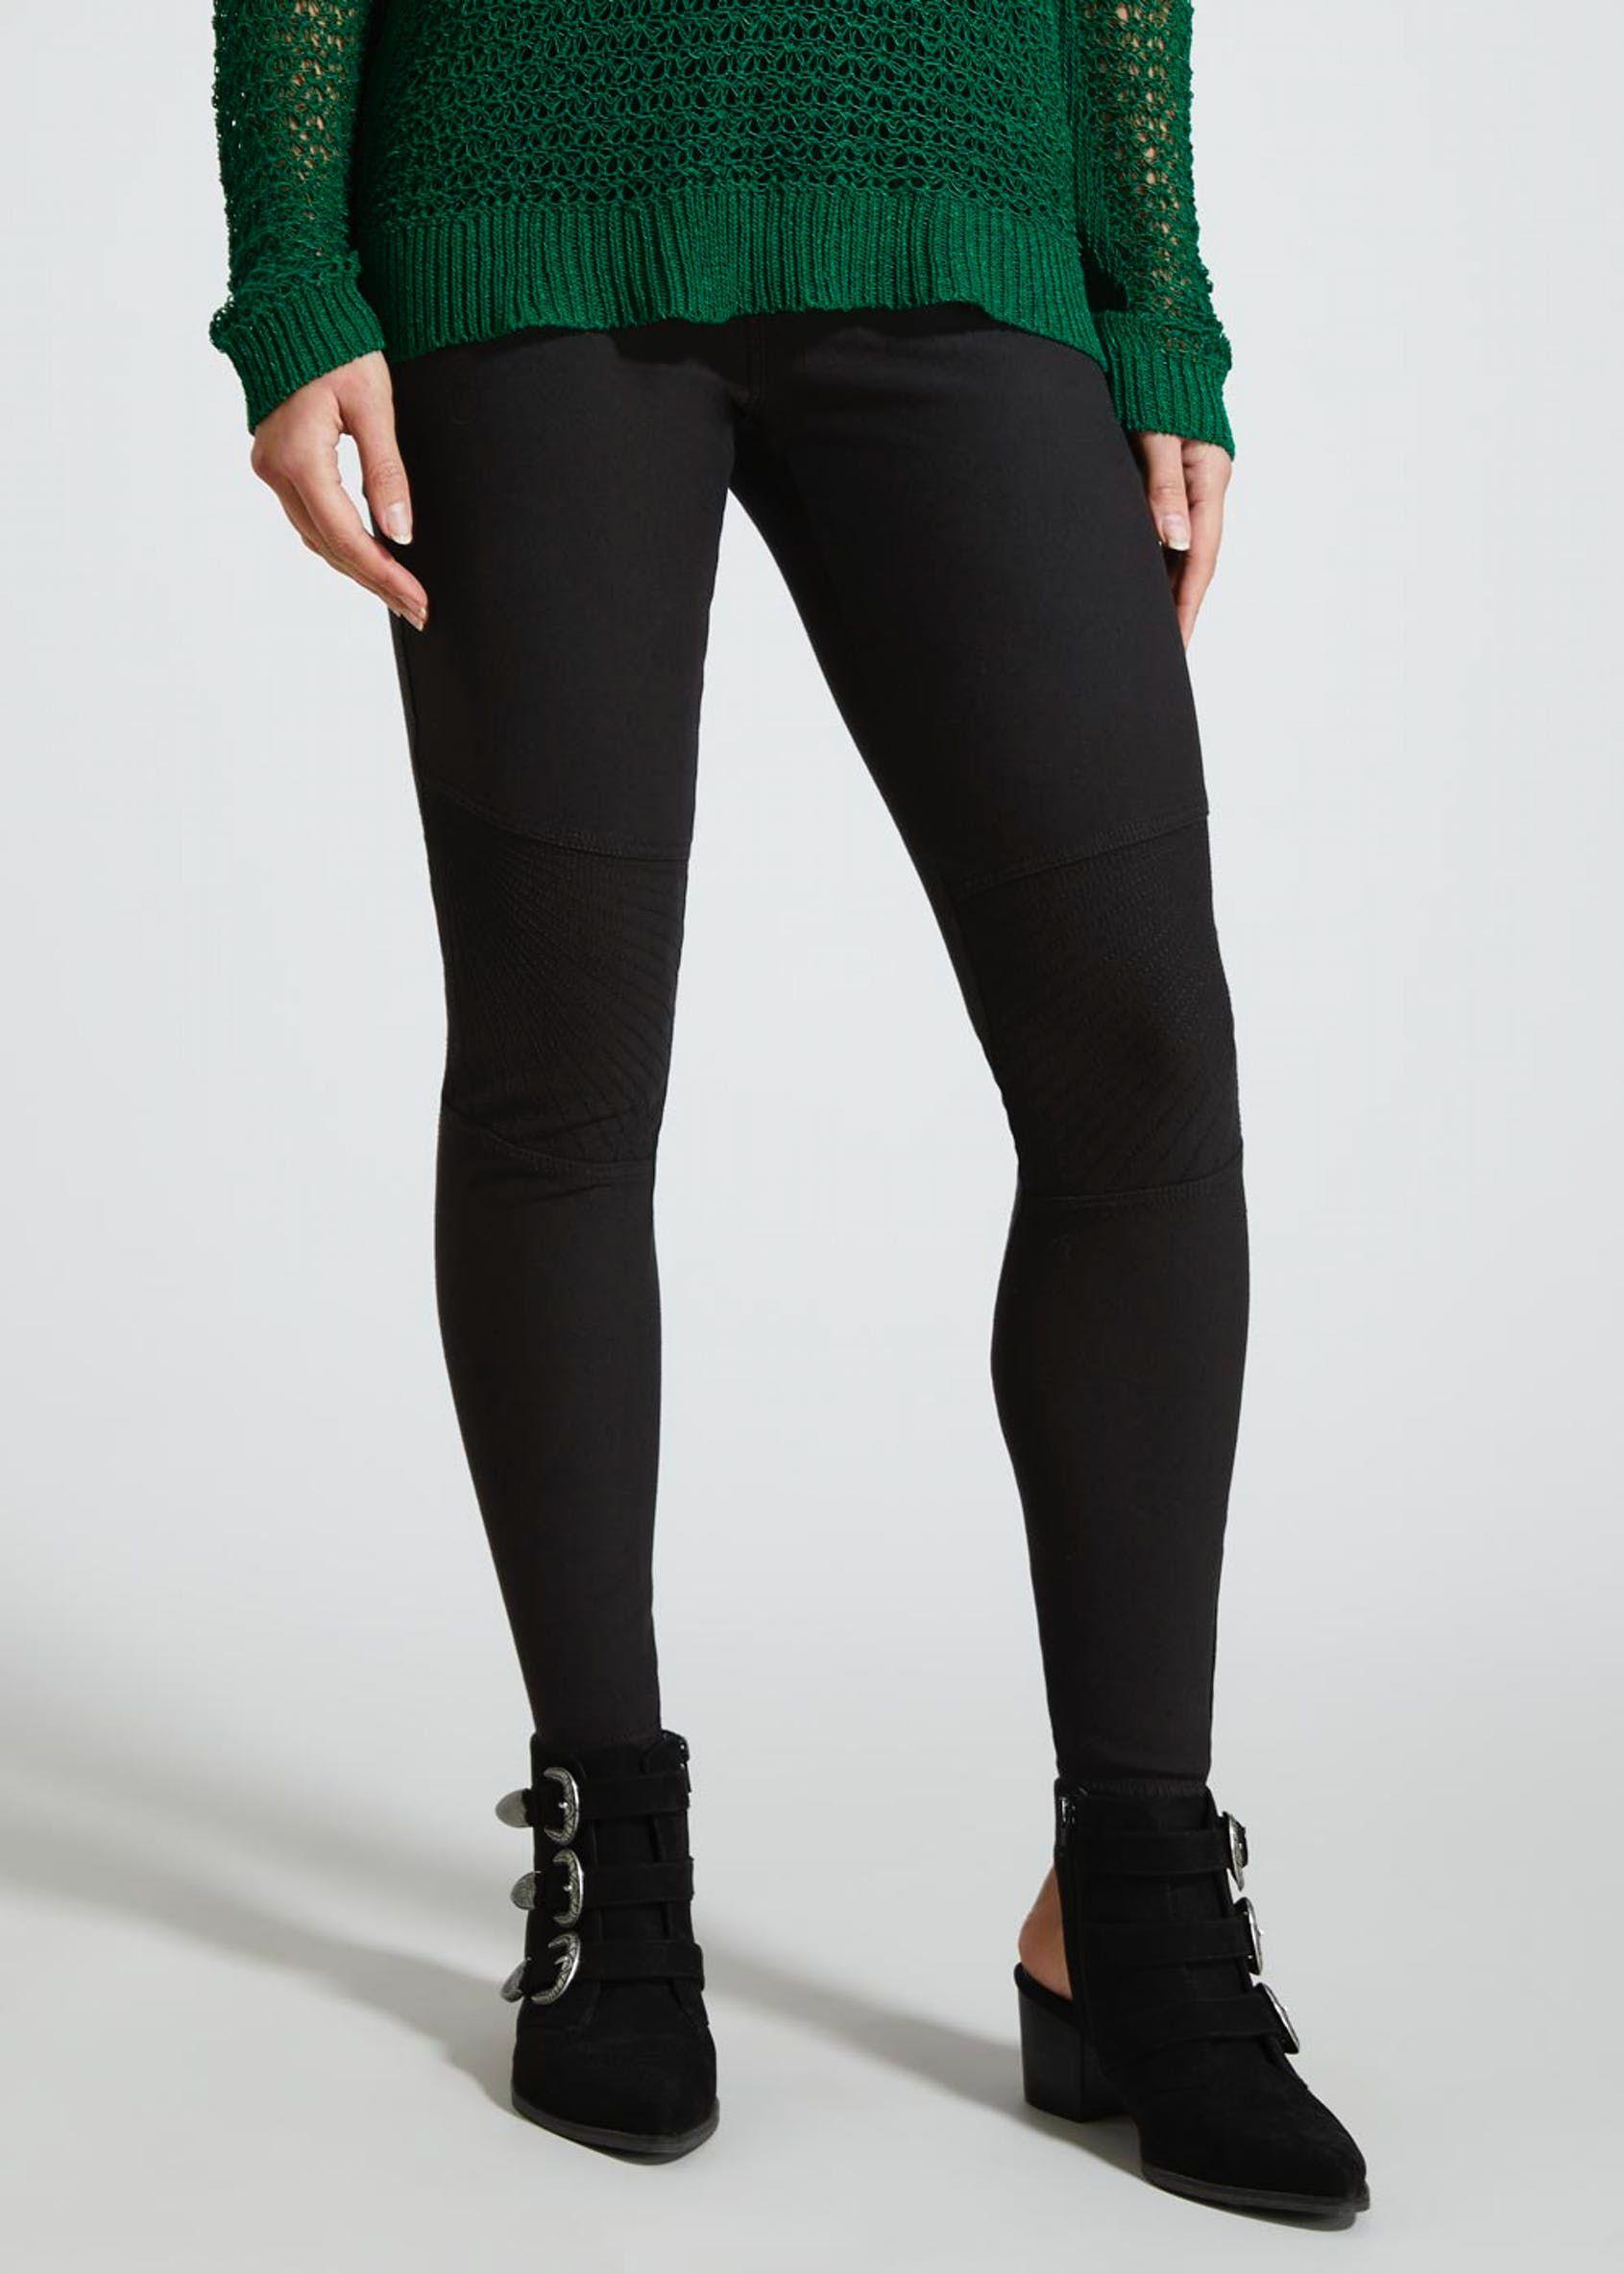 761b775f0c0545 Denim Biker Leggings – Black in 2019   Shoes Boots Bags   Biker ...